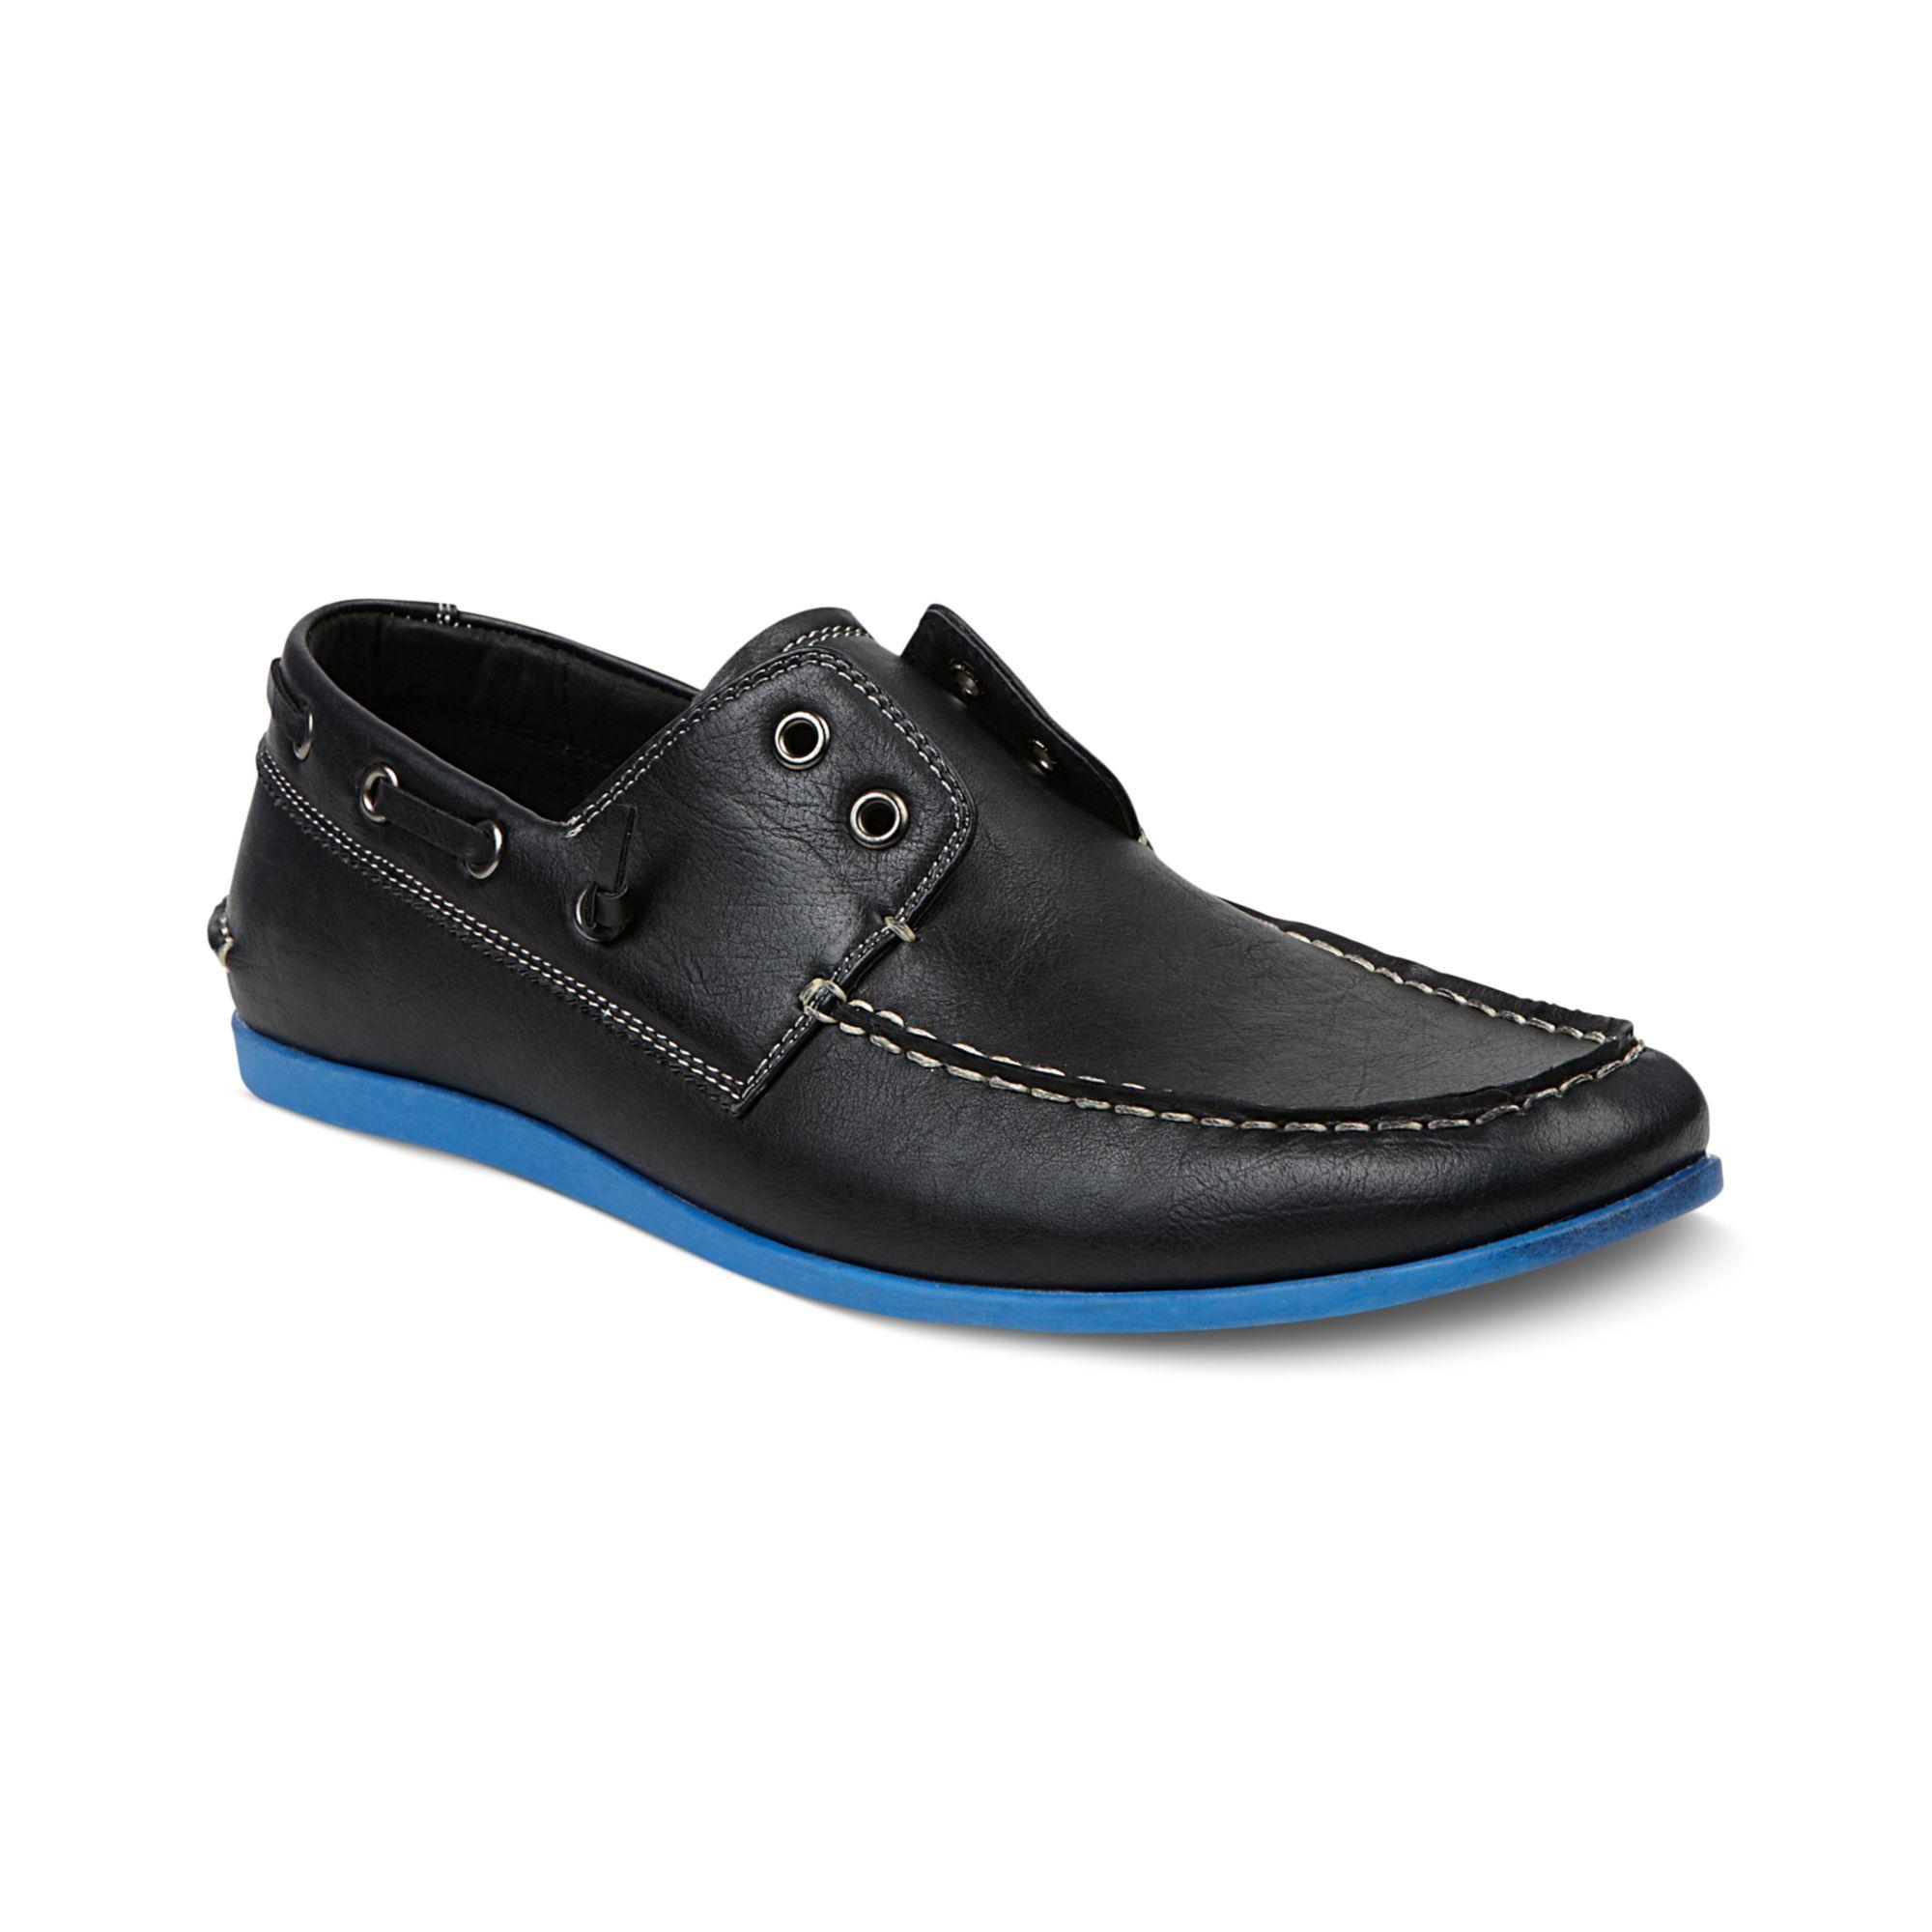 Steve Madden Madden Men'S Shoes, Gamer Boat Shoes in Blue for Men